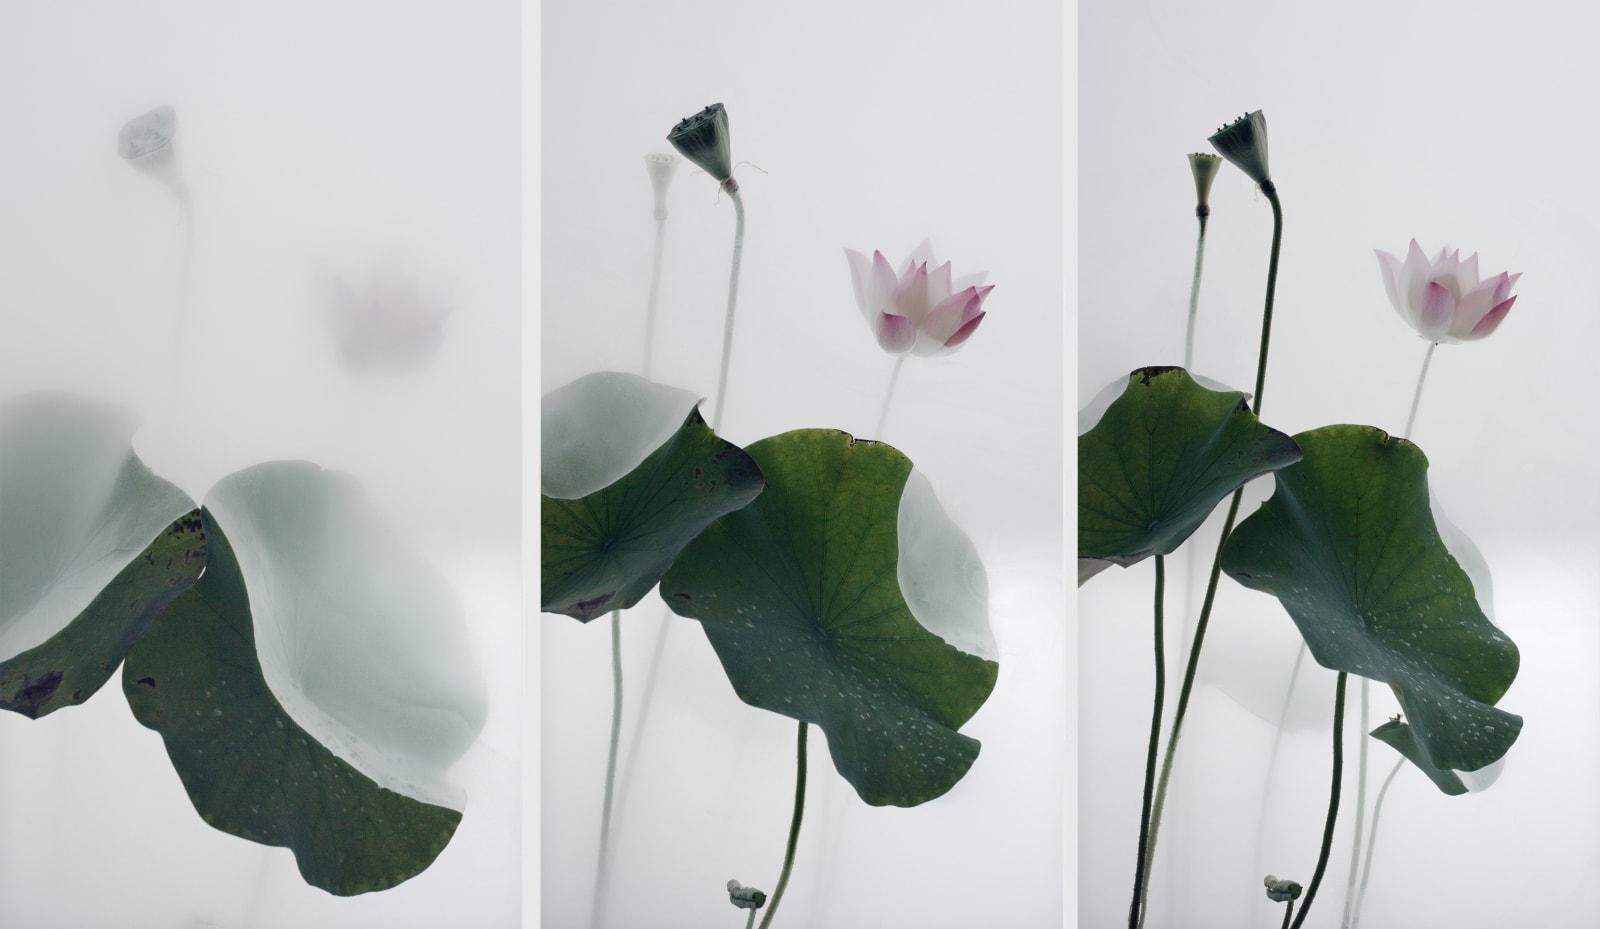 Wu Chi-Tsung 吳季璁, Still Life 010 - Lotus 小品之十 – 荷, 2018